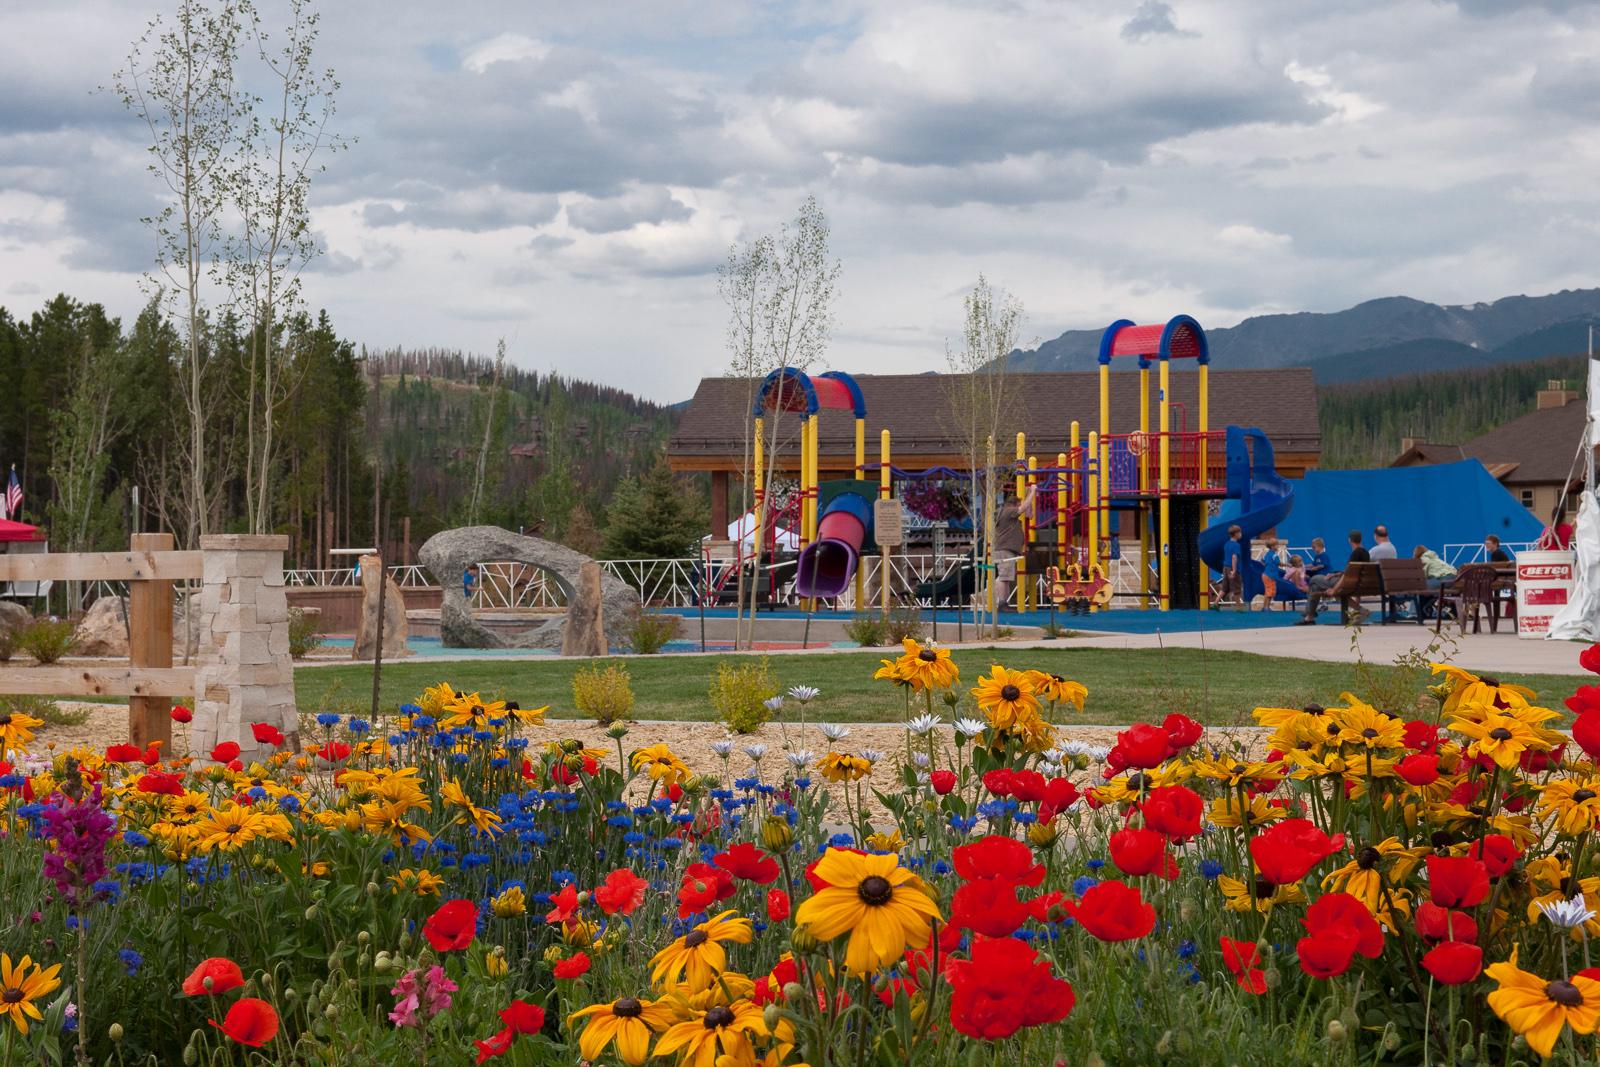 Flowers and playground